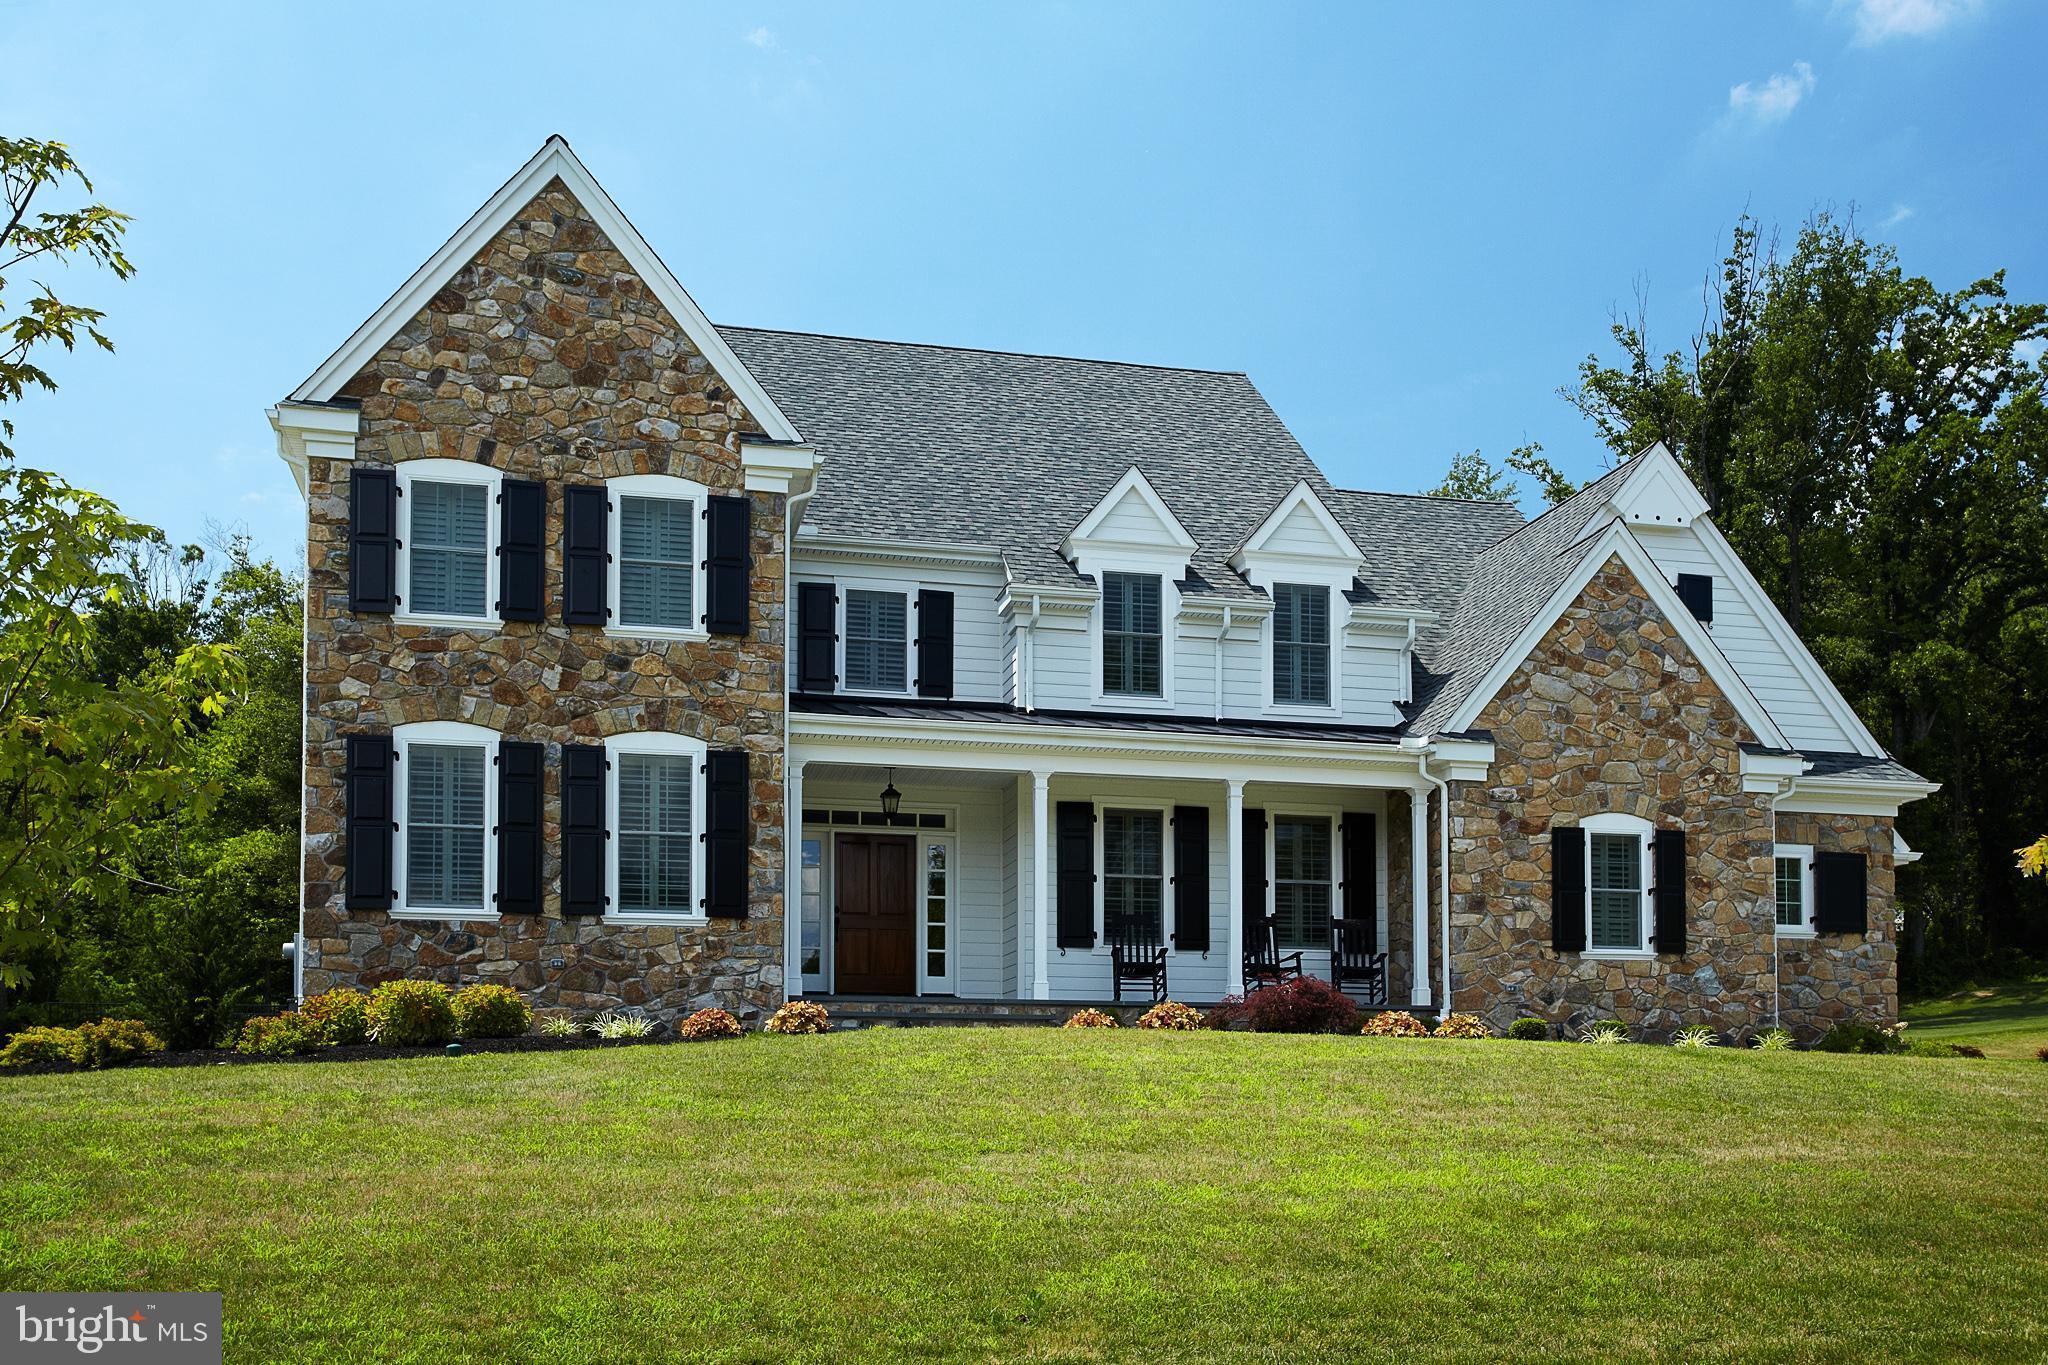 553B HOPWOOD ROAD, COLLEGEVILLE, Pennsylvania 19426, 4 Bedrooms Bedrooms, ,4 BathroomsBathrooms,Single Family,For Sale,553B HOPWOOD ROAD,PAMC687466